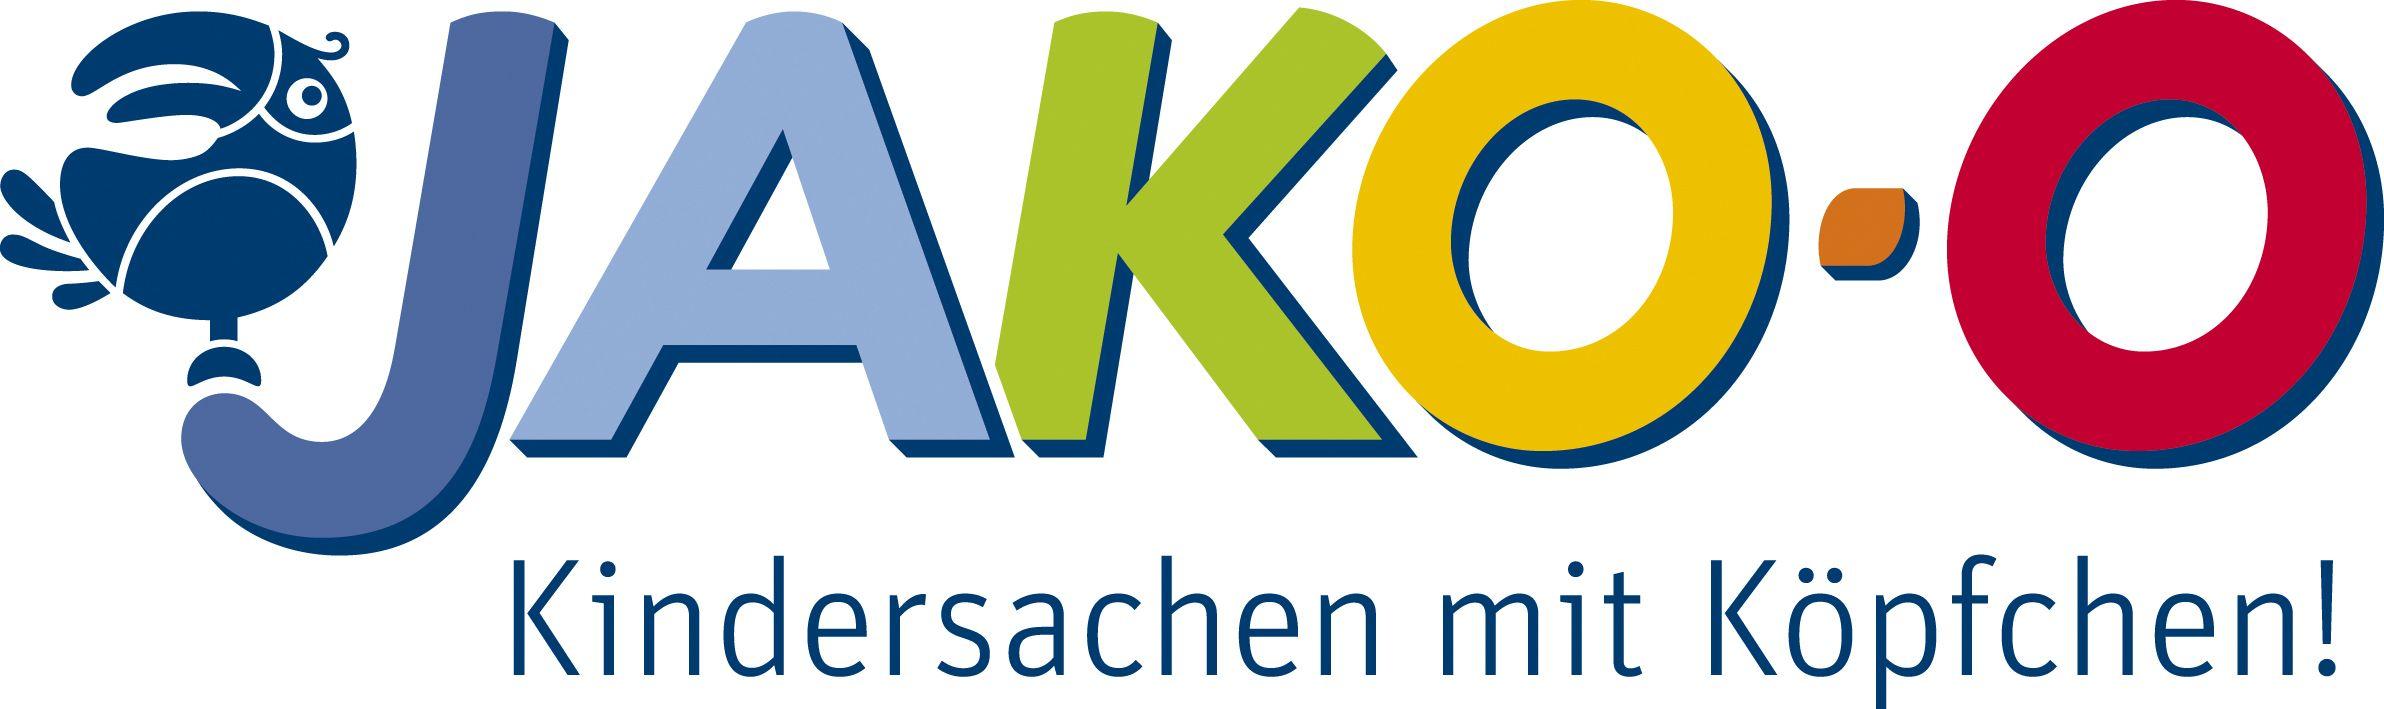 [Lokal] 50% auf Alles @ Jako-O in Stuttgart